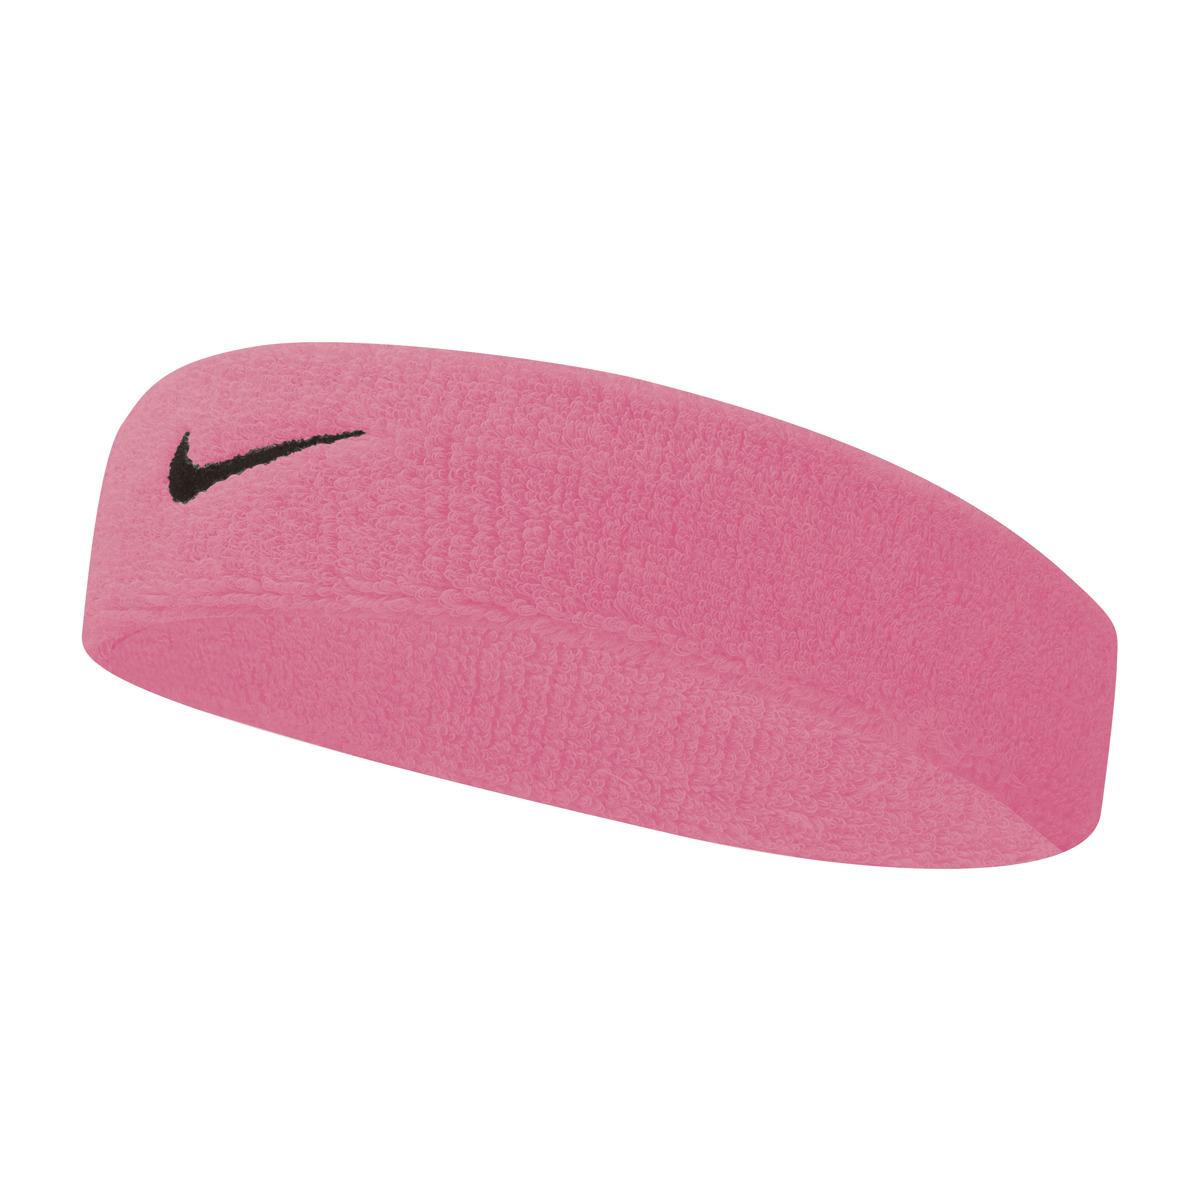 Cinta del pelo Swoosh Nike